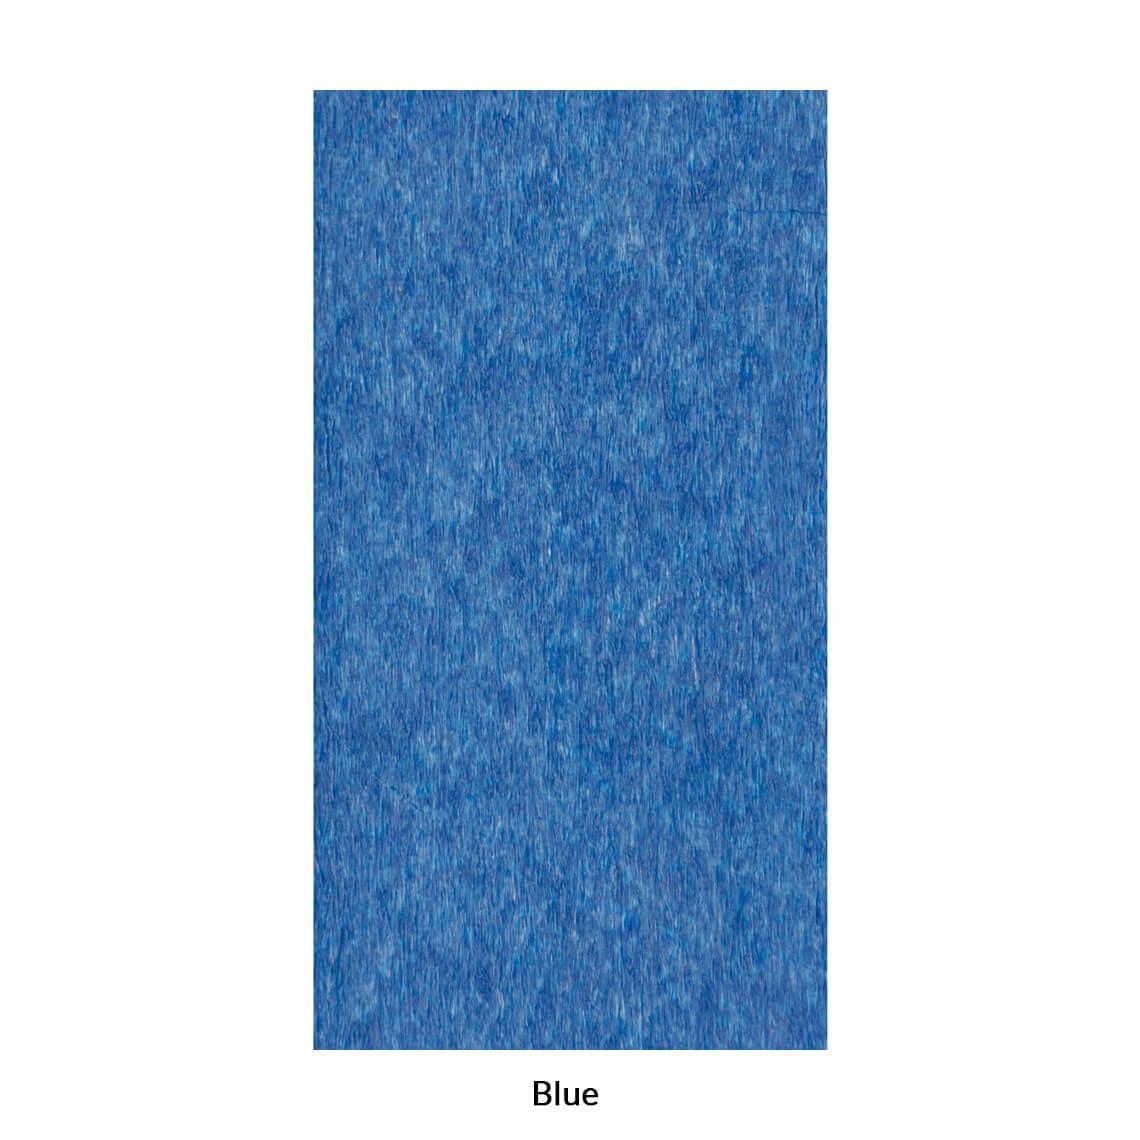 15.-blue.jpg